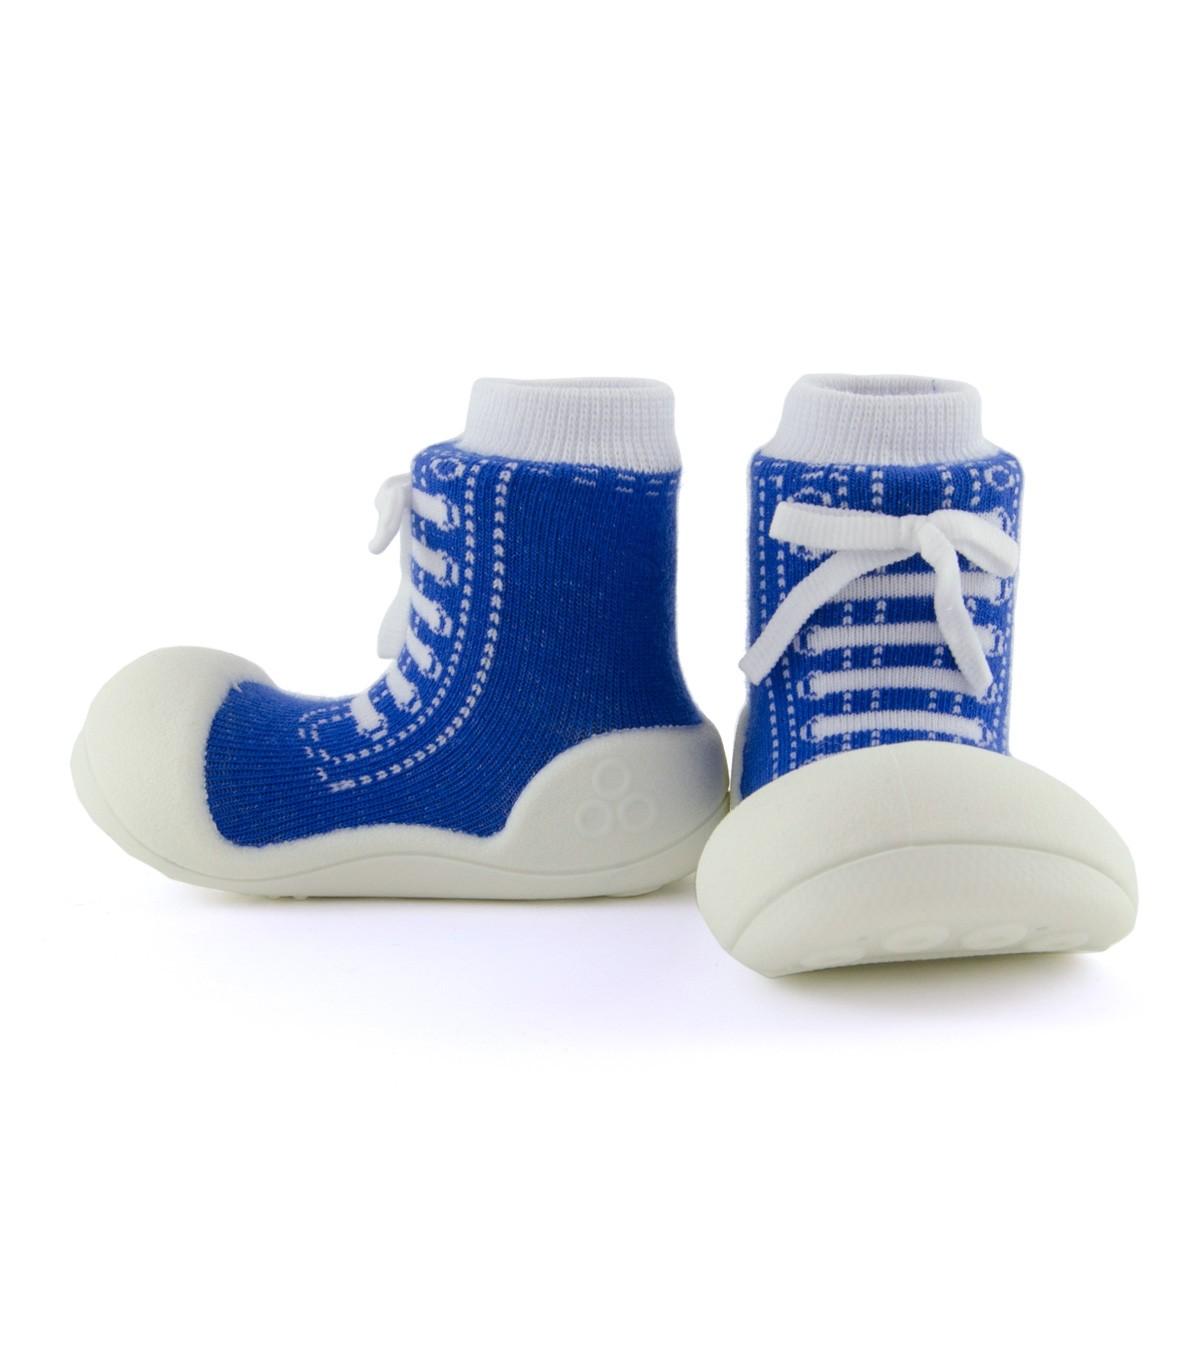 zapatos sneakers zapatos azul 20 attipas sneakers Pg4qwPFx